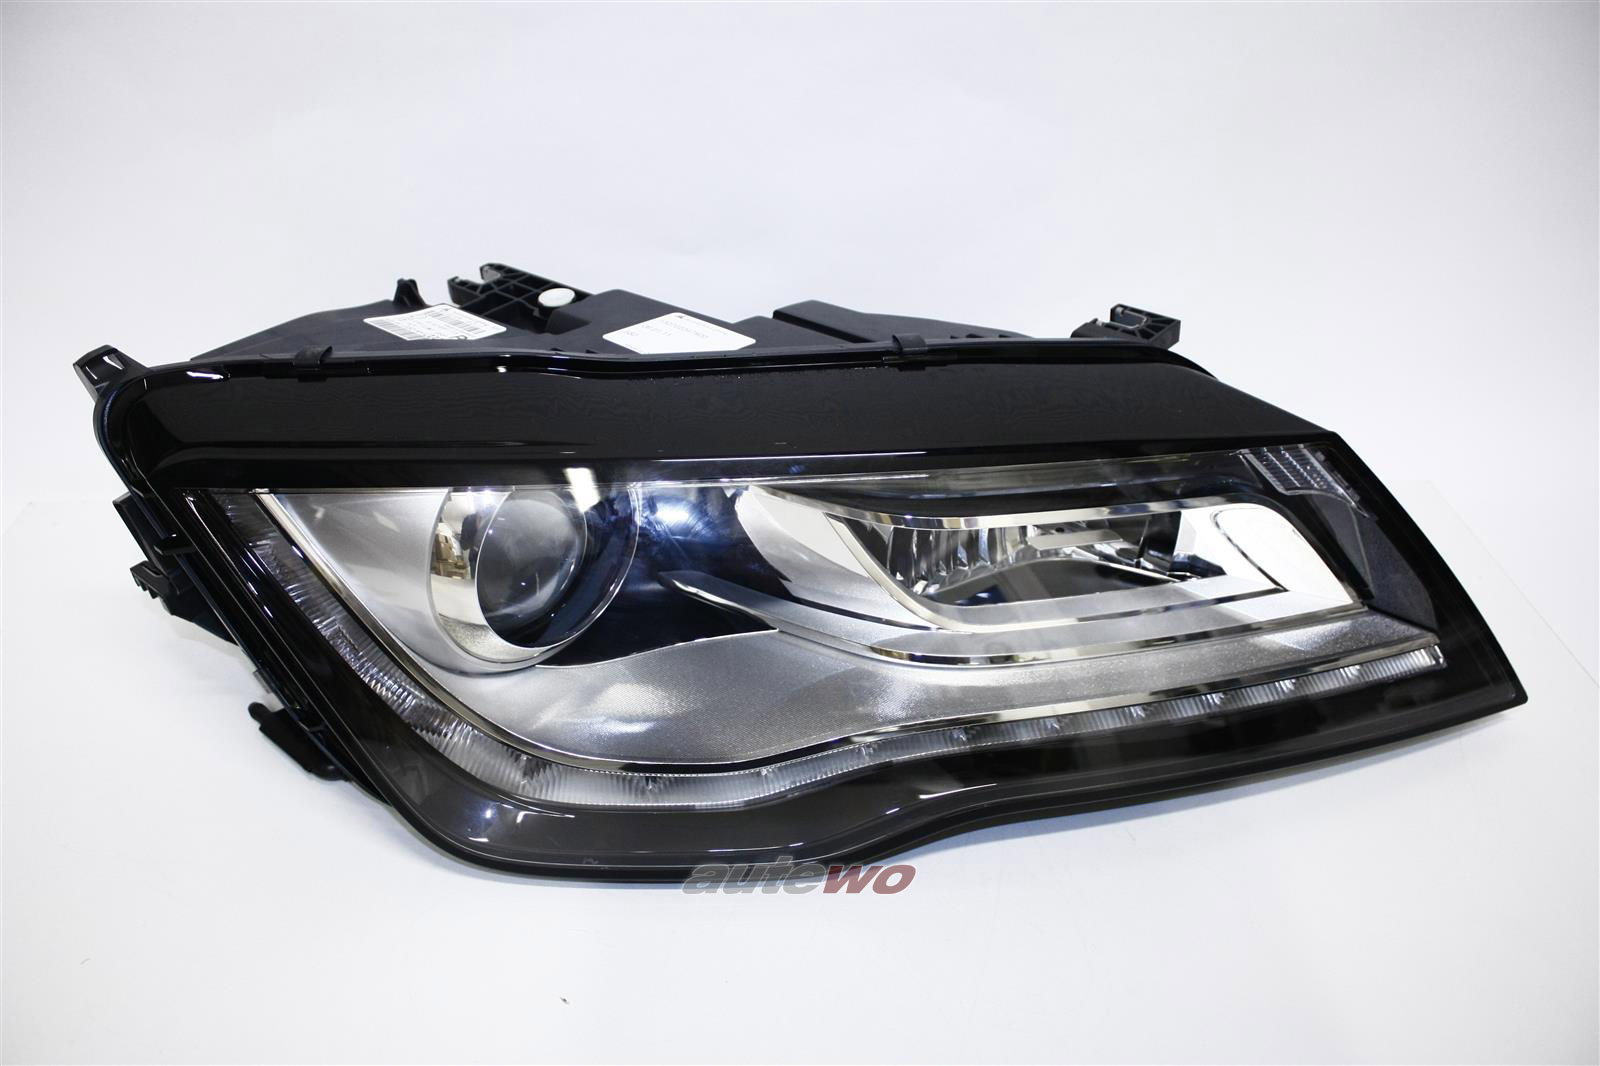 4G8941754A NEU&ORIGINAL Audi A7/RS7 Bi-Xenon-Scheinwerfer RHD Rechts